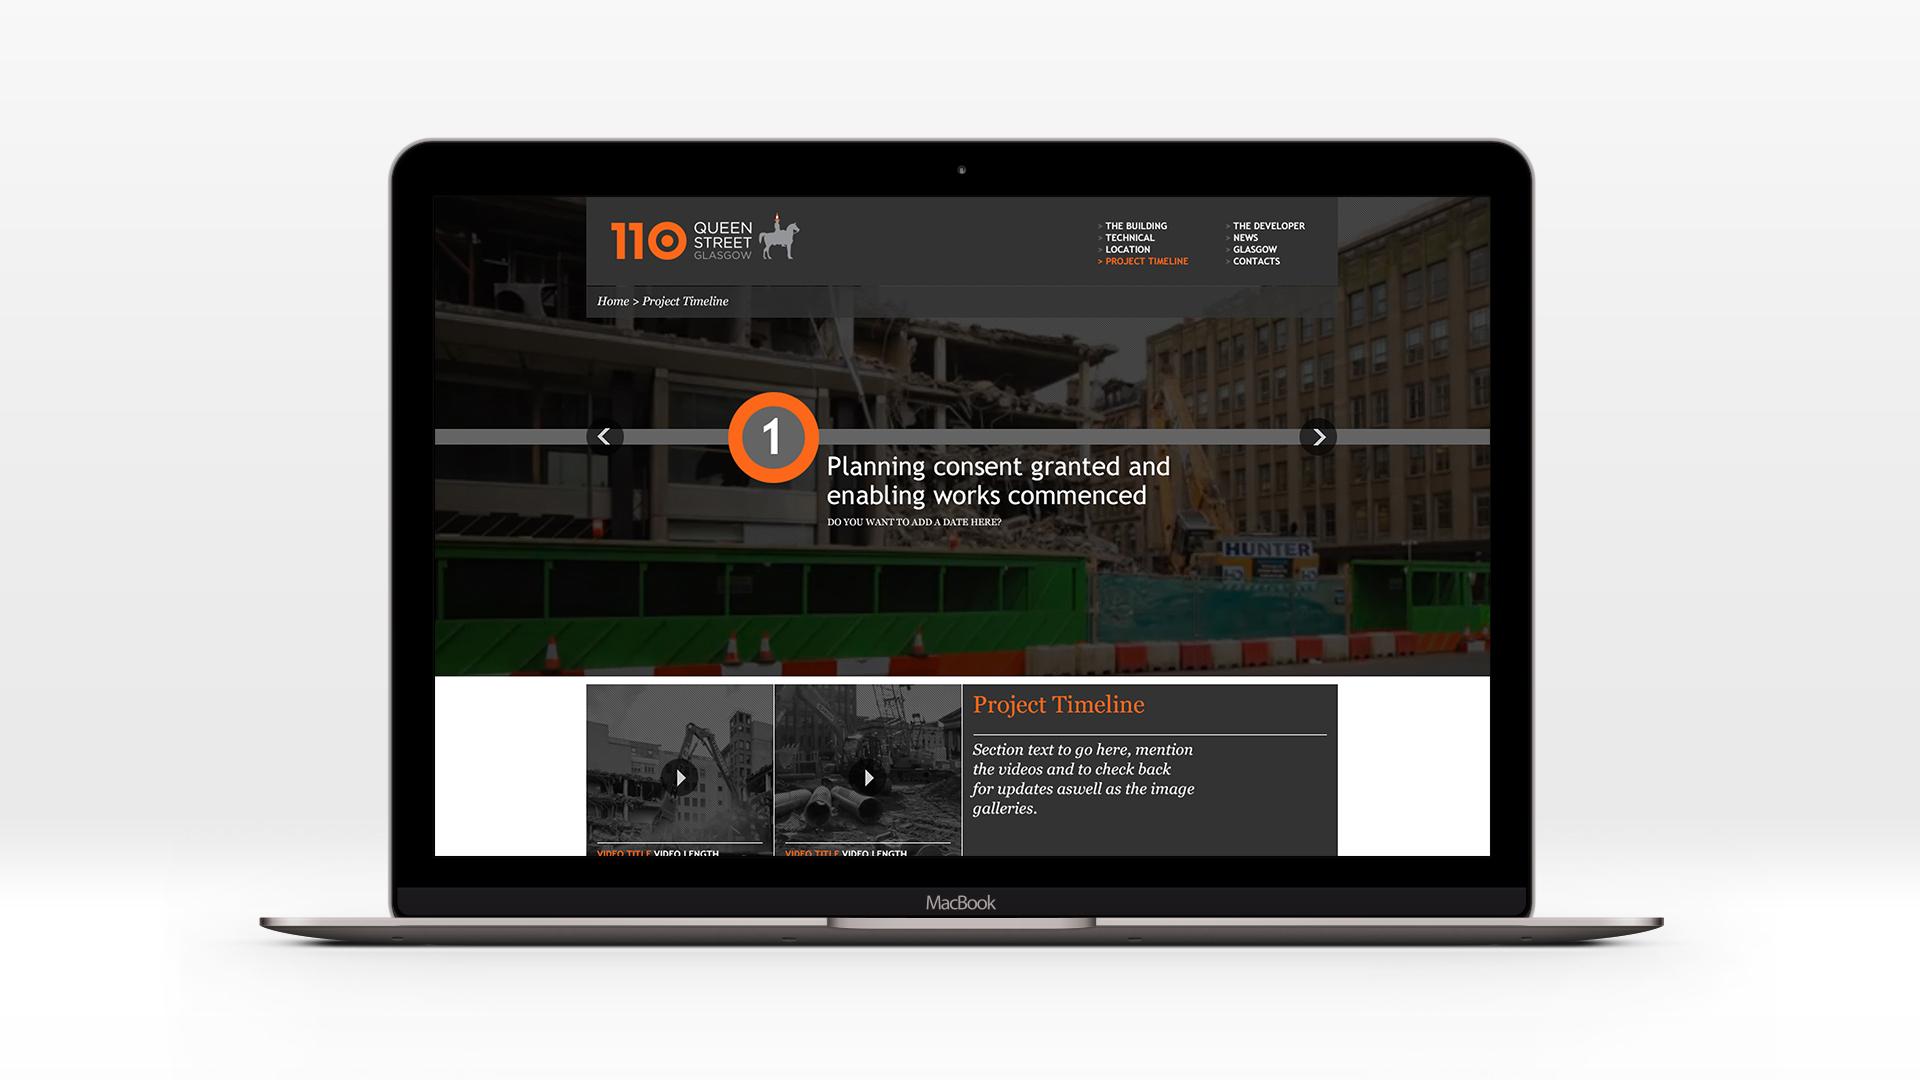 openagency_bam-brand_1920x1080_website_3